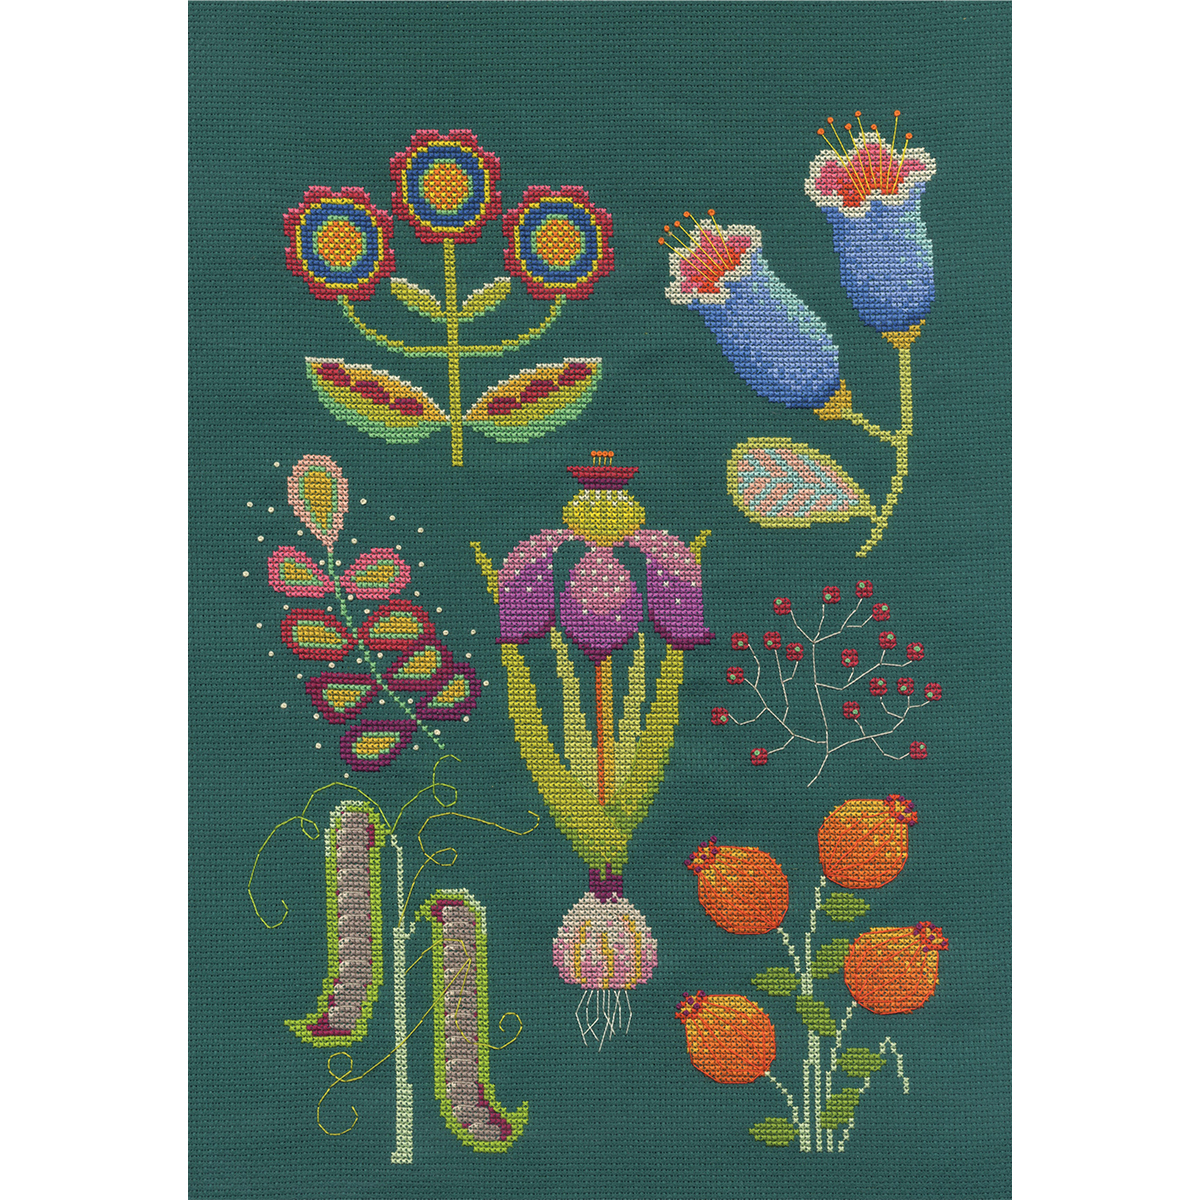 Garden botanical cross stitch kit by Emily Peacock